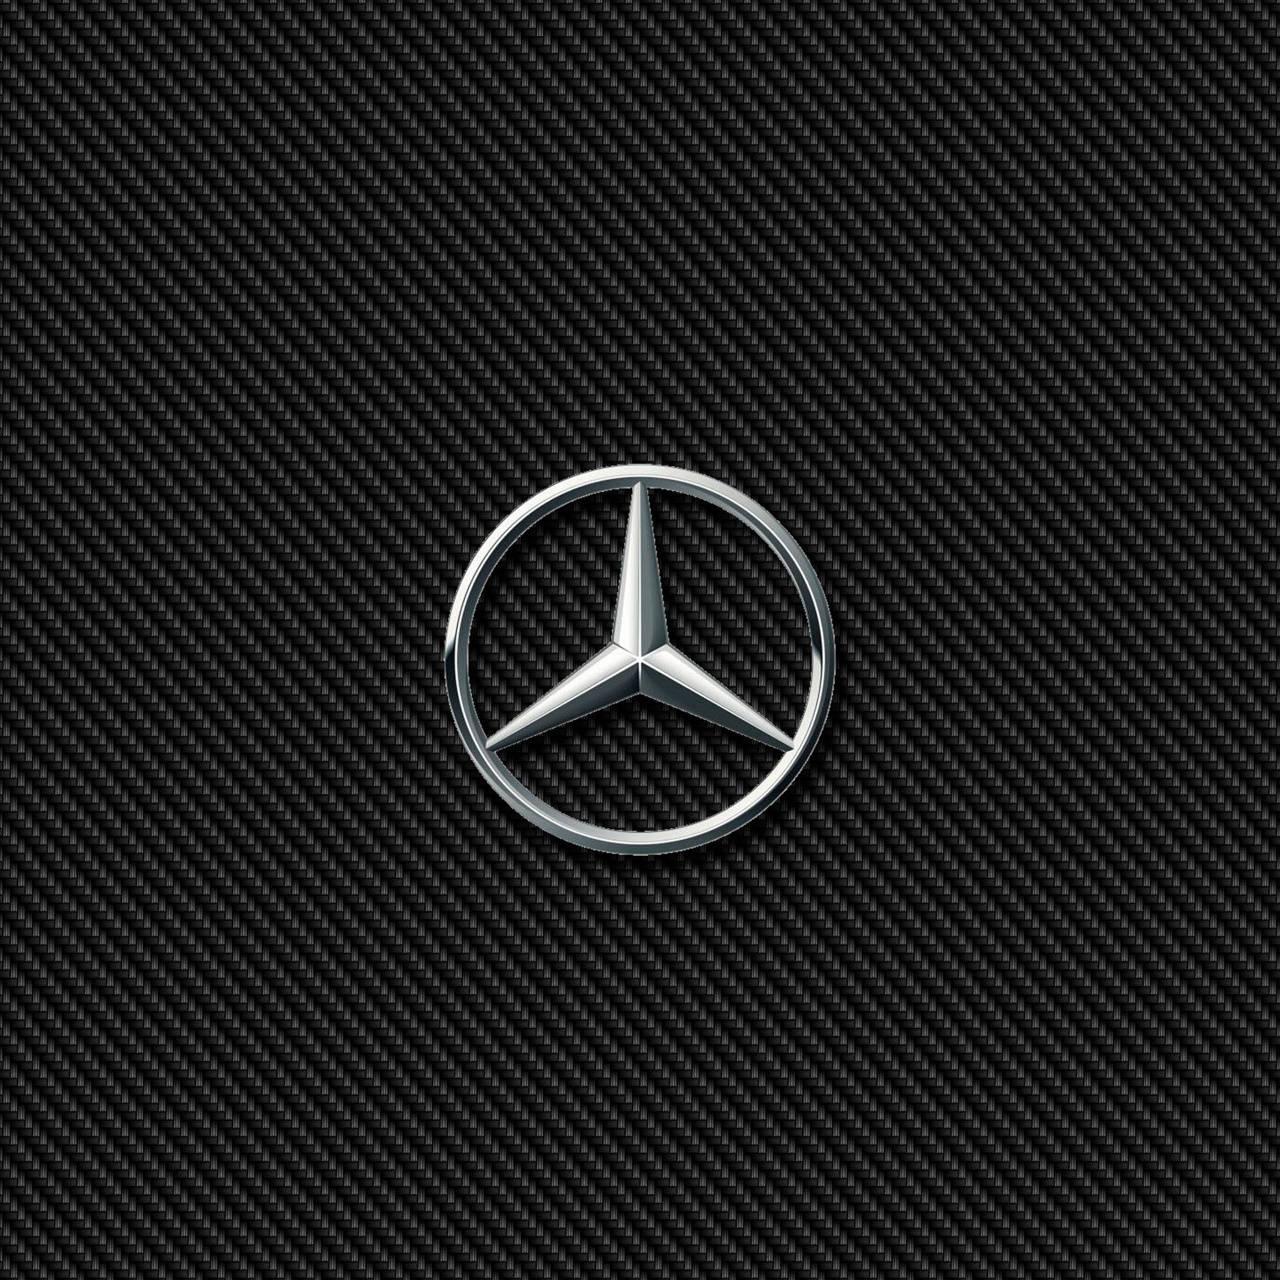 Mercedes Star Carbon